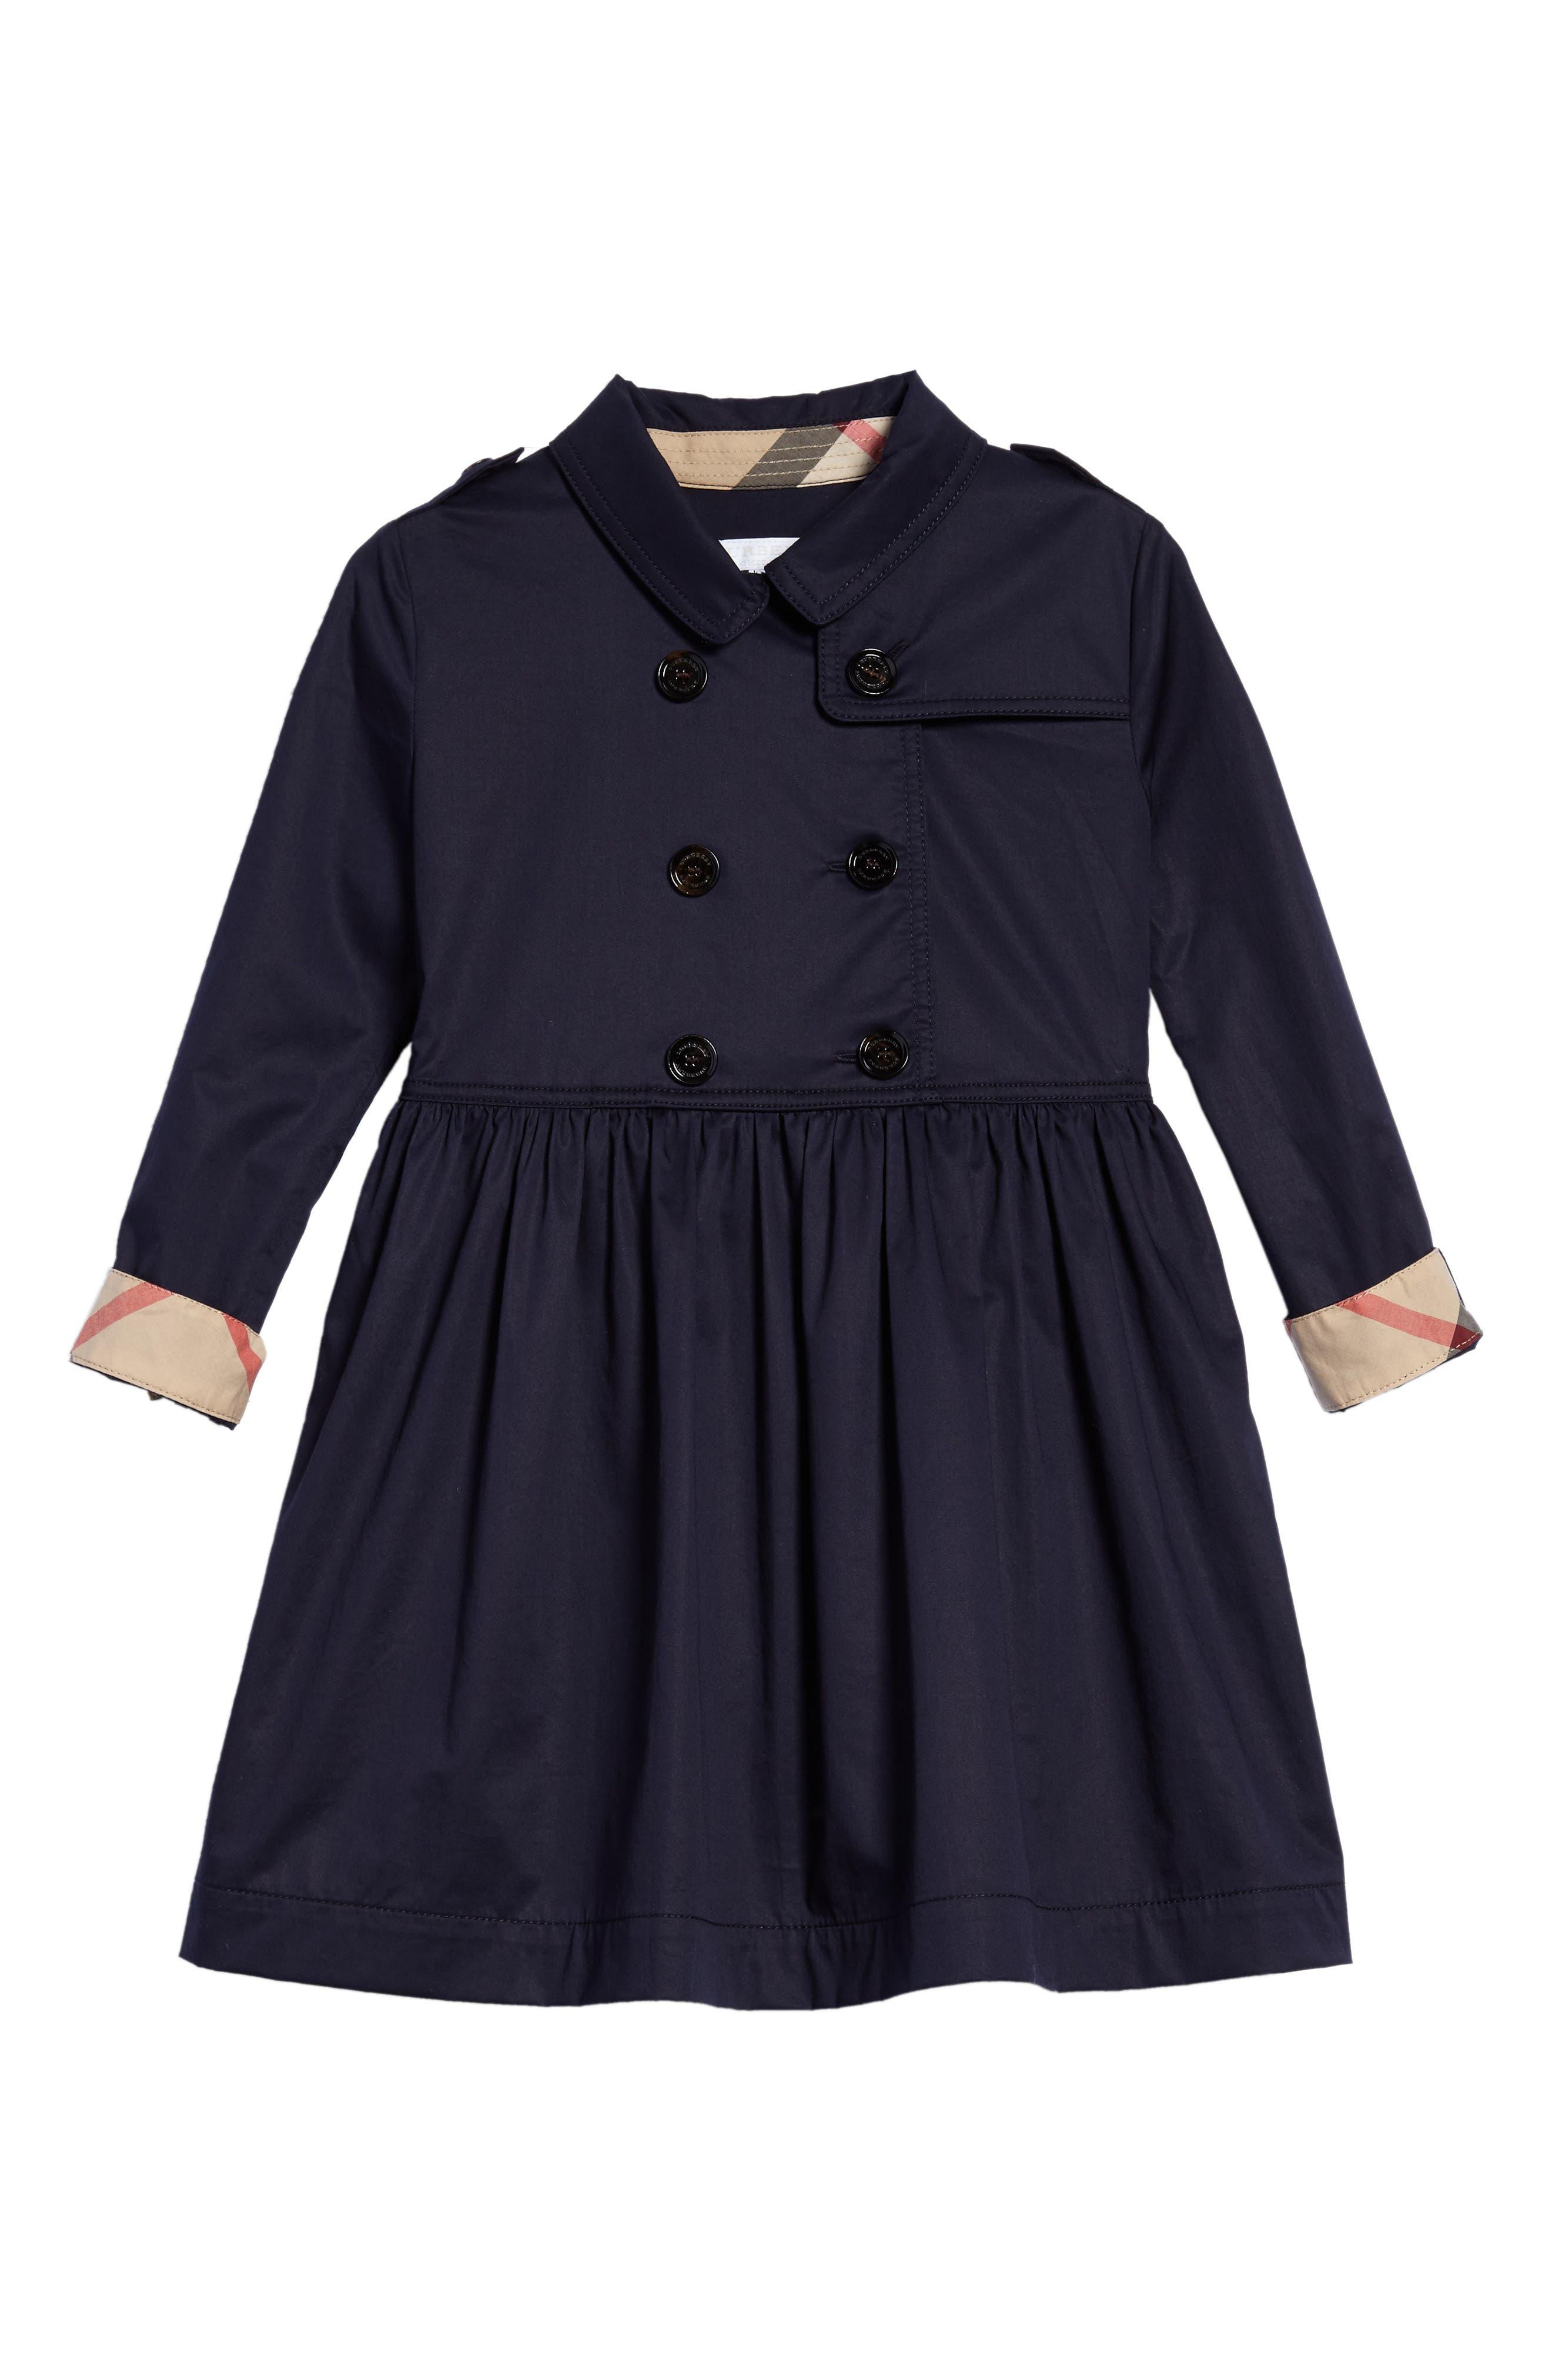 Alternate Image 1 Selected - Burberry Lillyana Trench Dress (Little Girls & Big Girls)